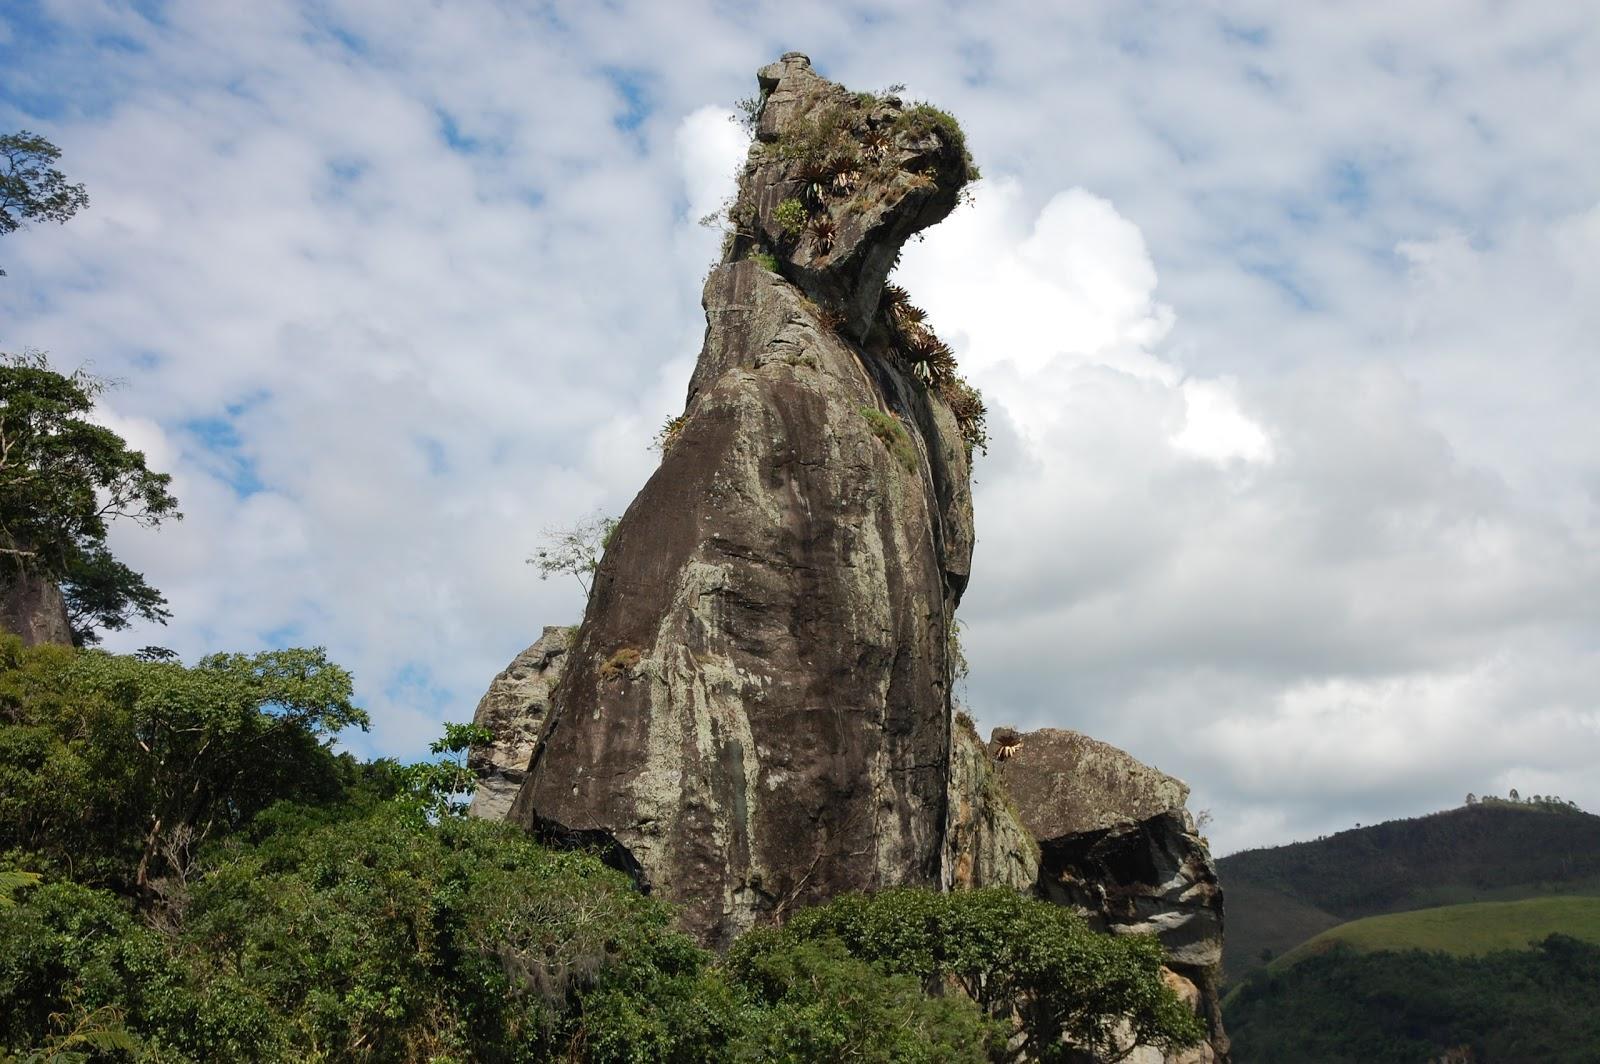 Gc6g3b5 Pedra Do Cão Sentado Earthcache In Rio De Janeiro